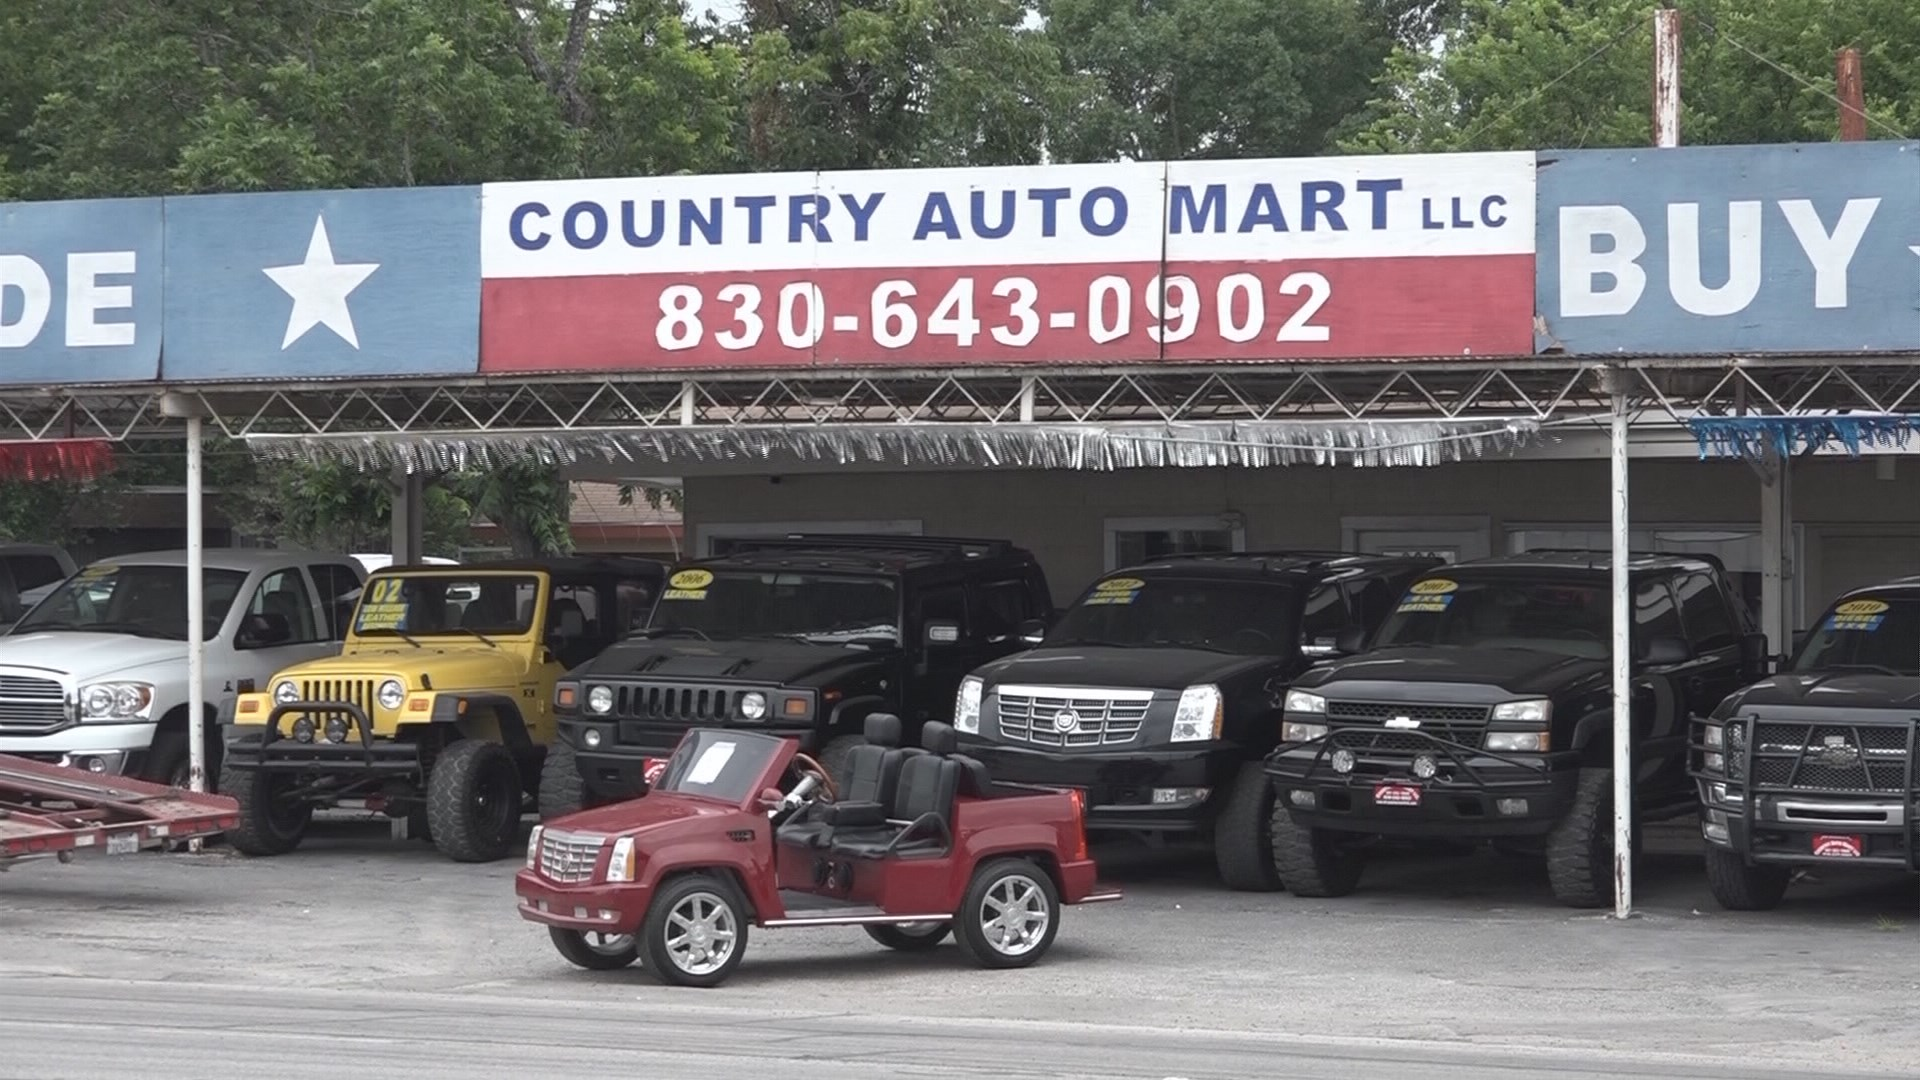 Car Mart Prices Good